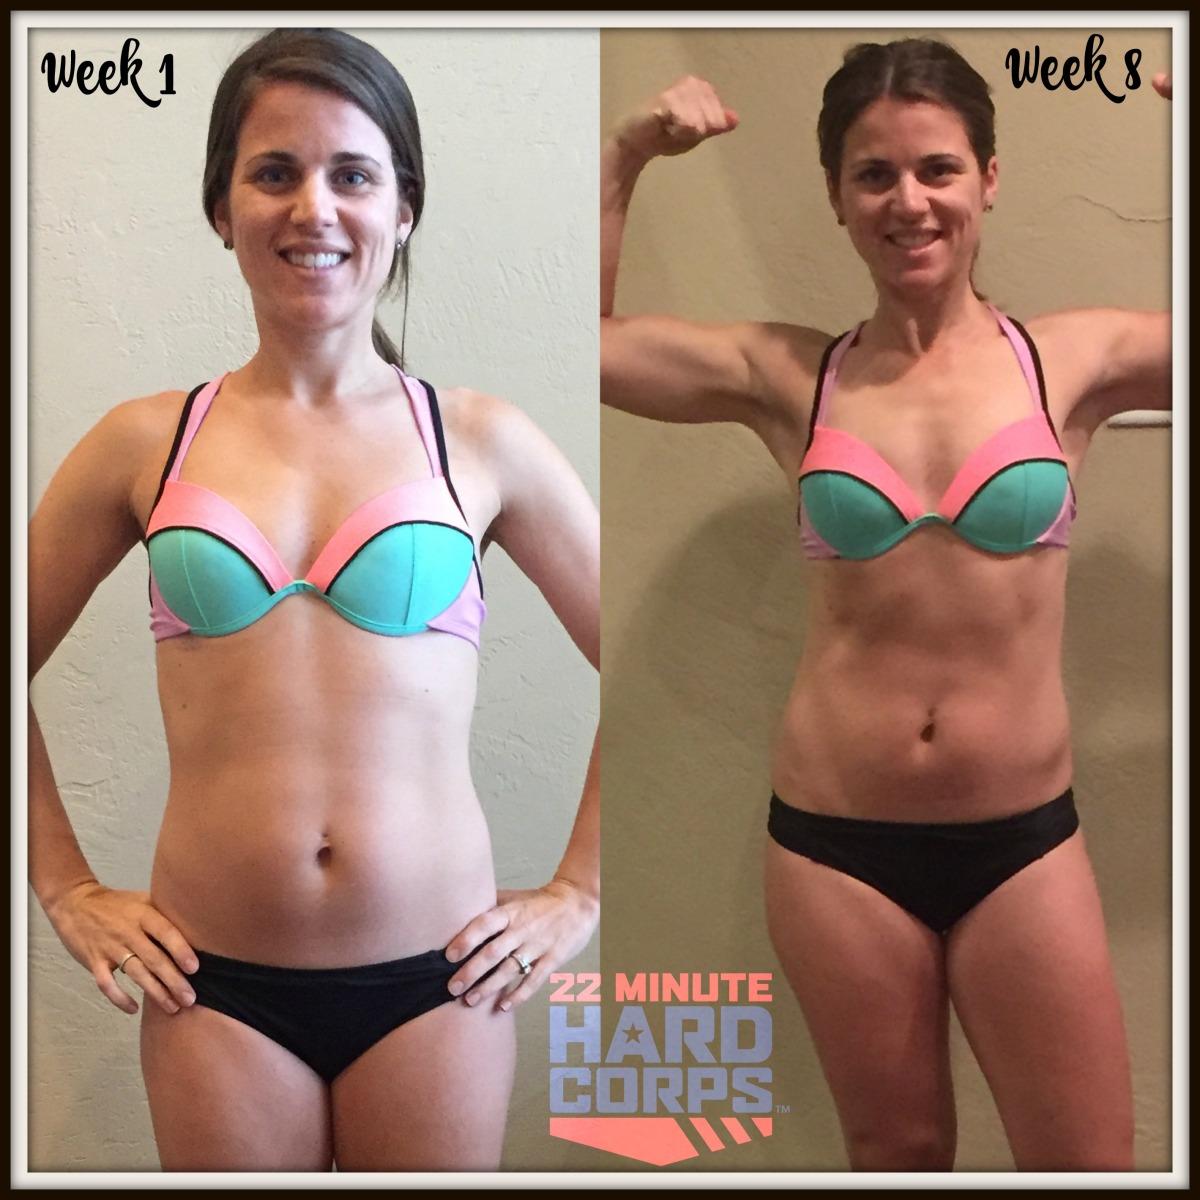 Maegan Blinka, Megan Blinka, 22 Minute Hard Corps, Bikini Bootcamp results, Tony Horton workout program, 22 Minute Hard Corps results, 8 week results,